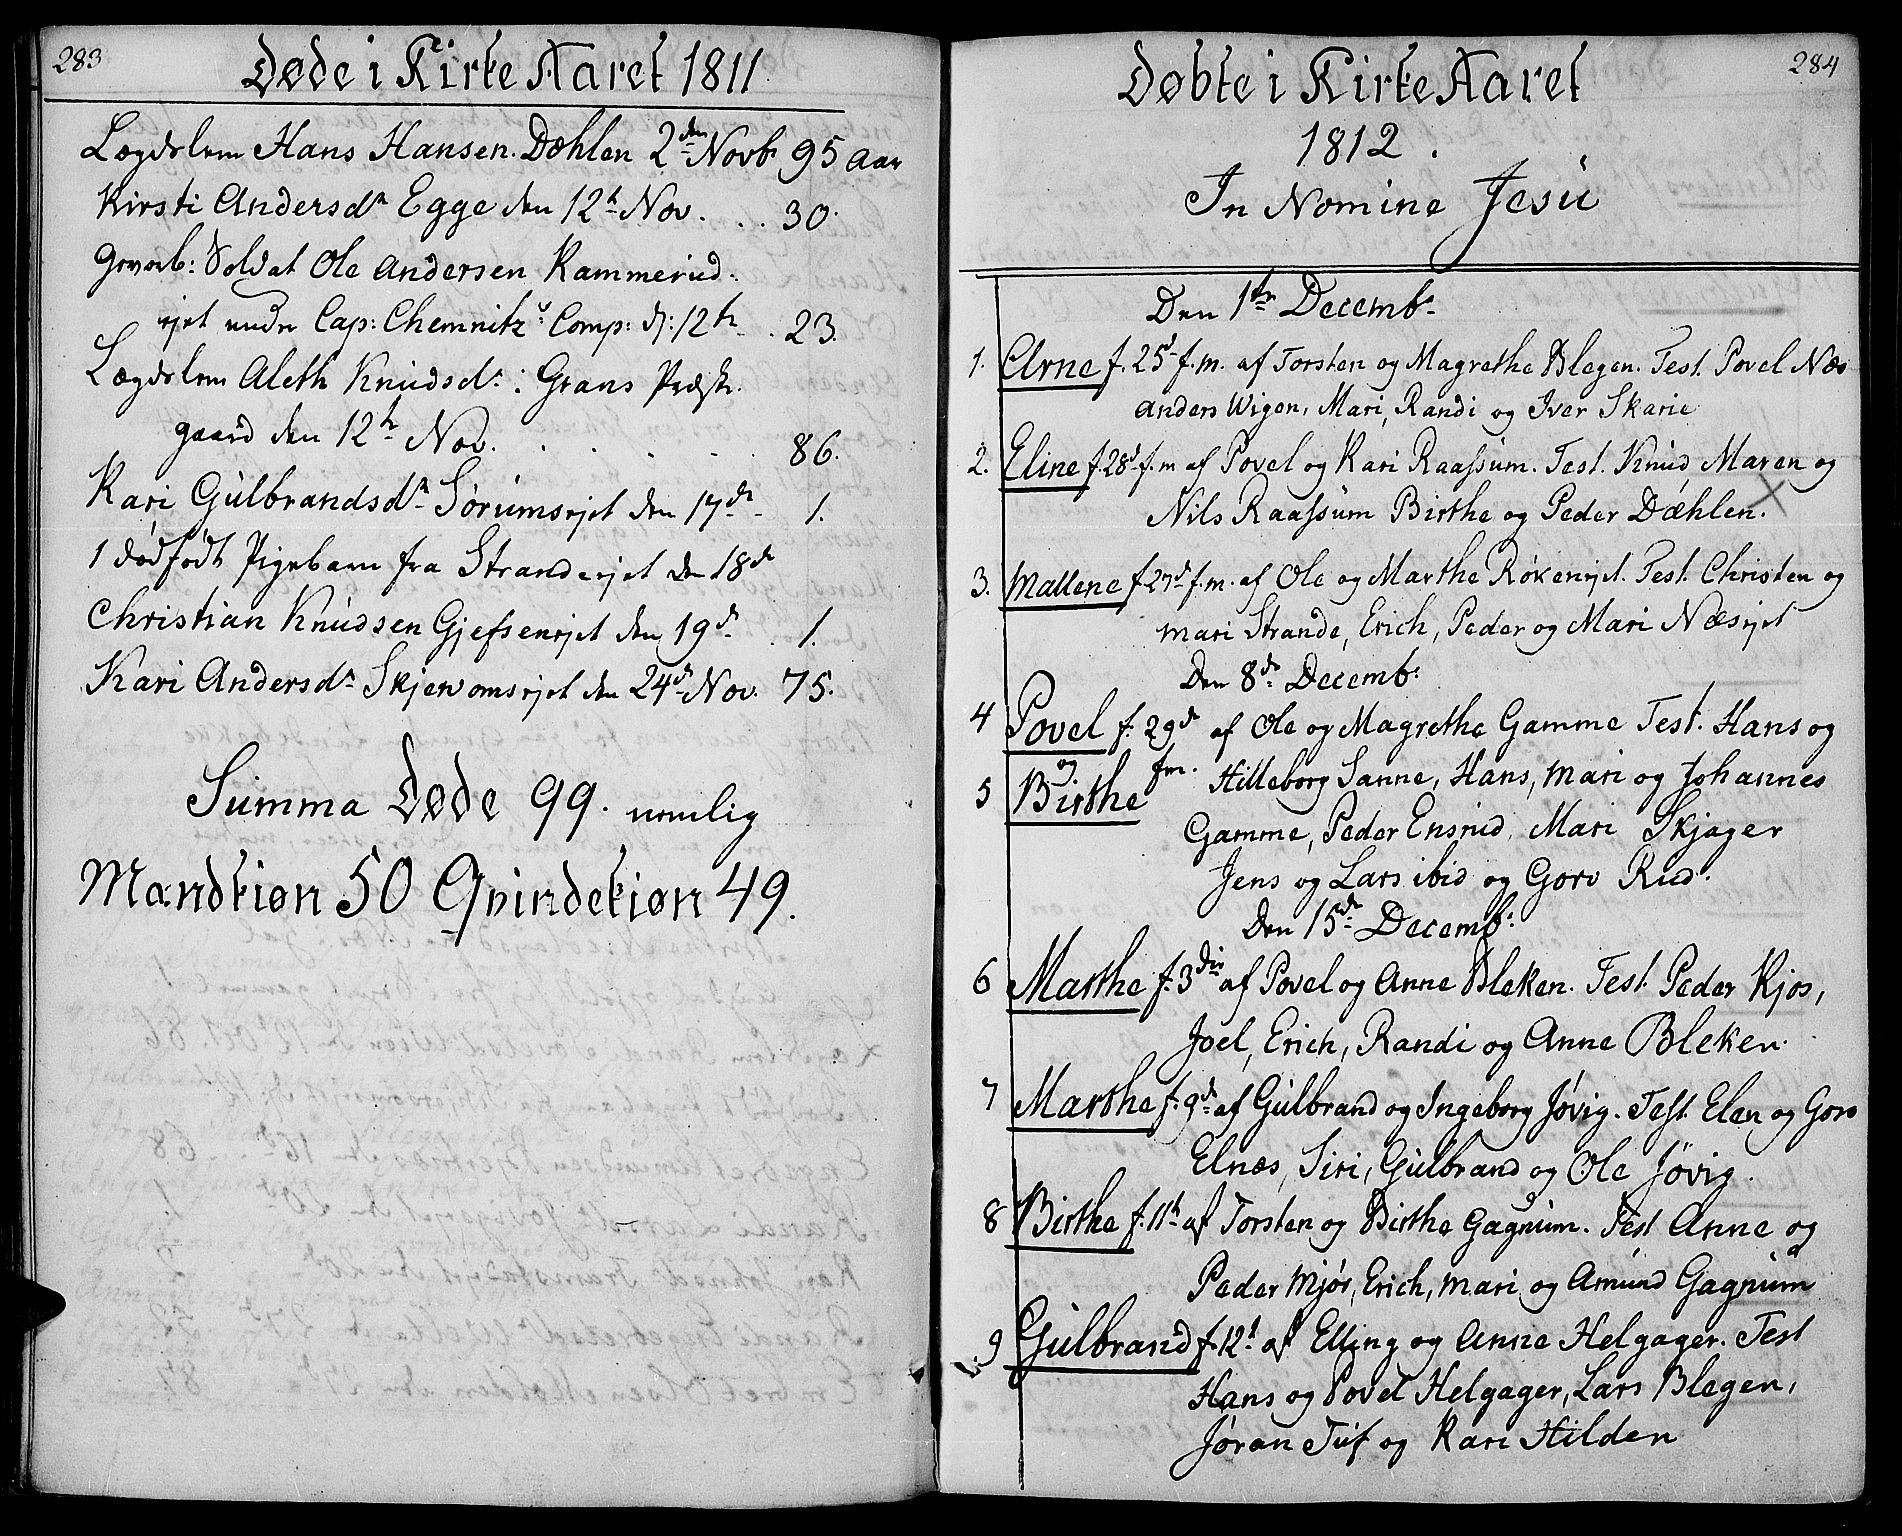 SAH, Gran prestekontor, Ministerialbok nr. 8, 1798-1811, s. 283-284